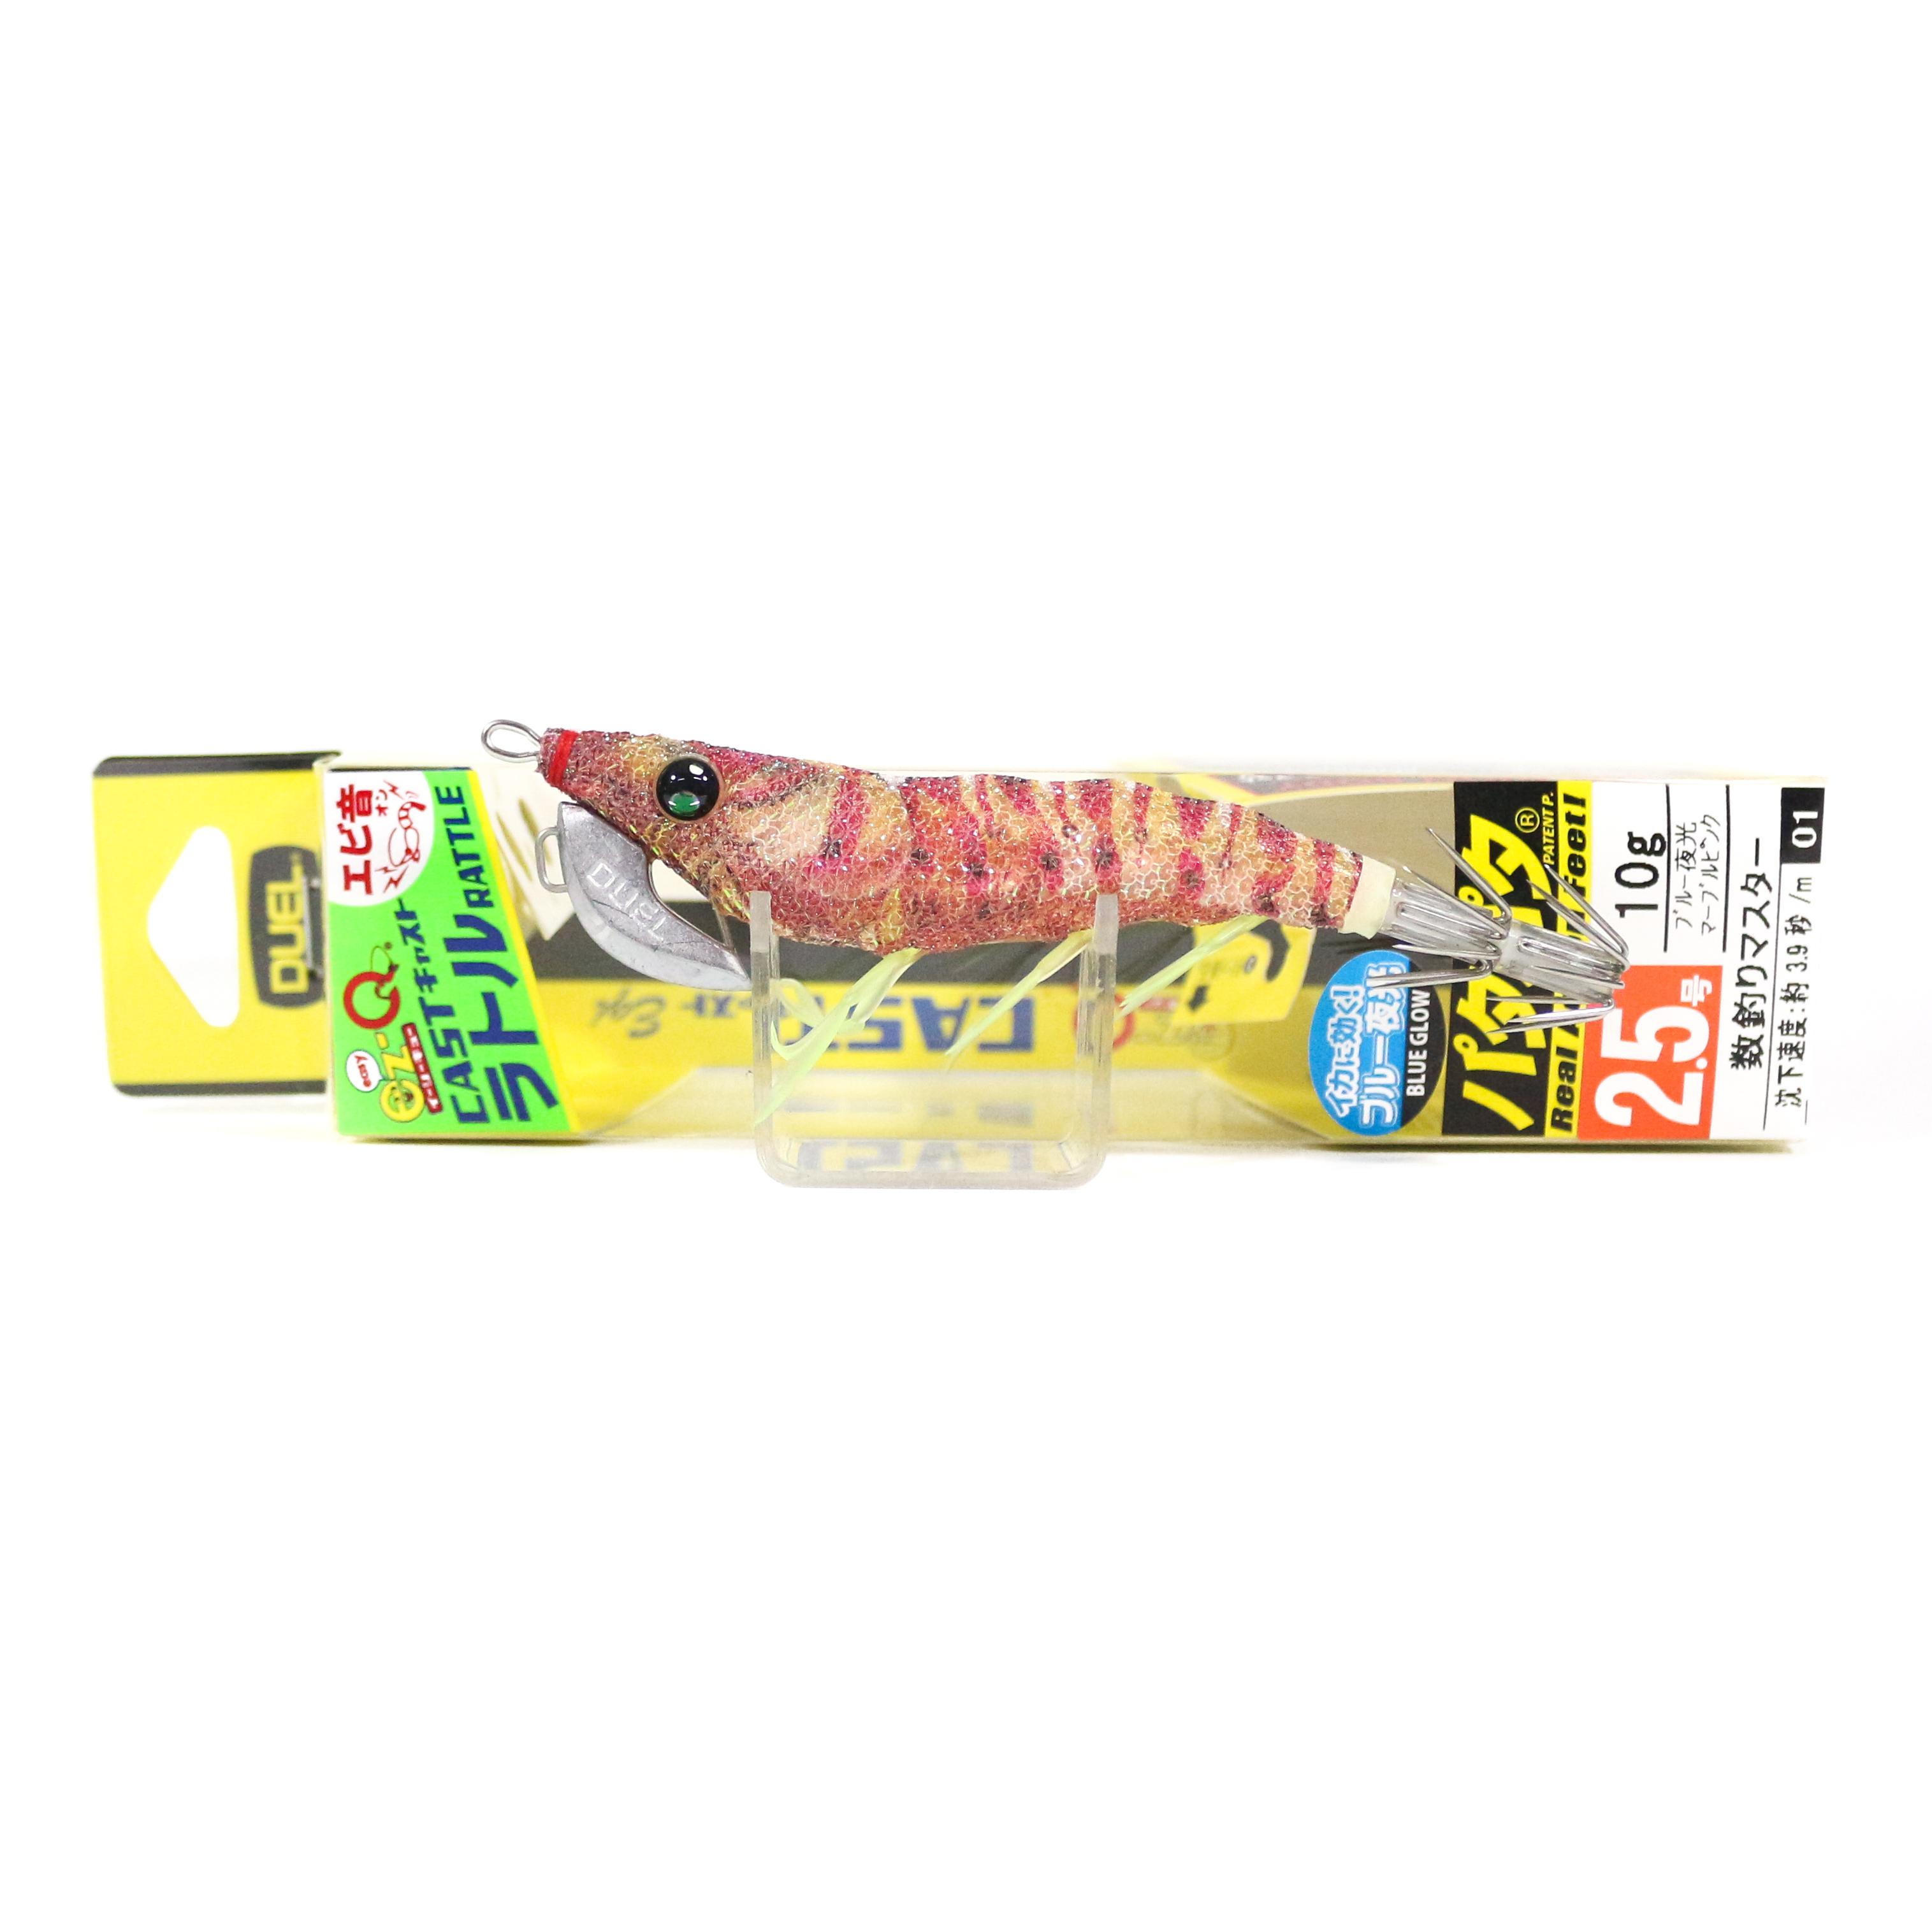 Yo Zuri Duel Egi EZ-Q Cast Rattle Squid Jig Sinking Lure 2.5 A1690-RKE (9352)